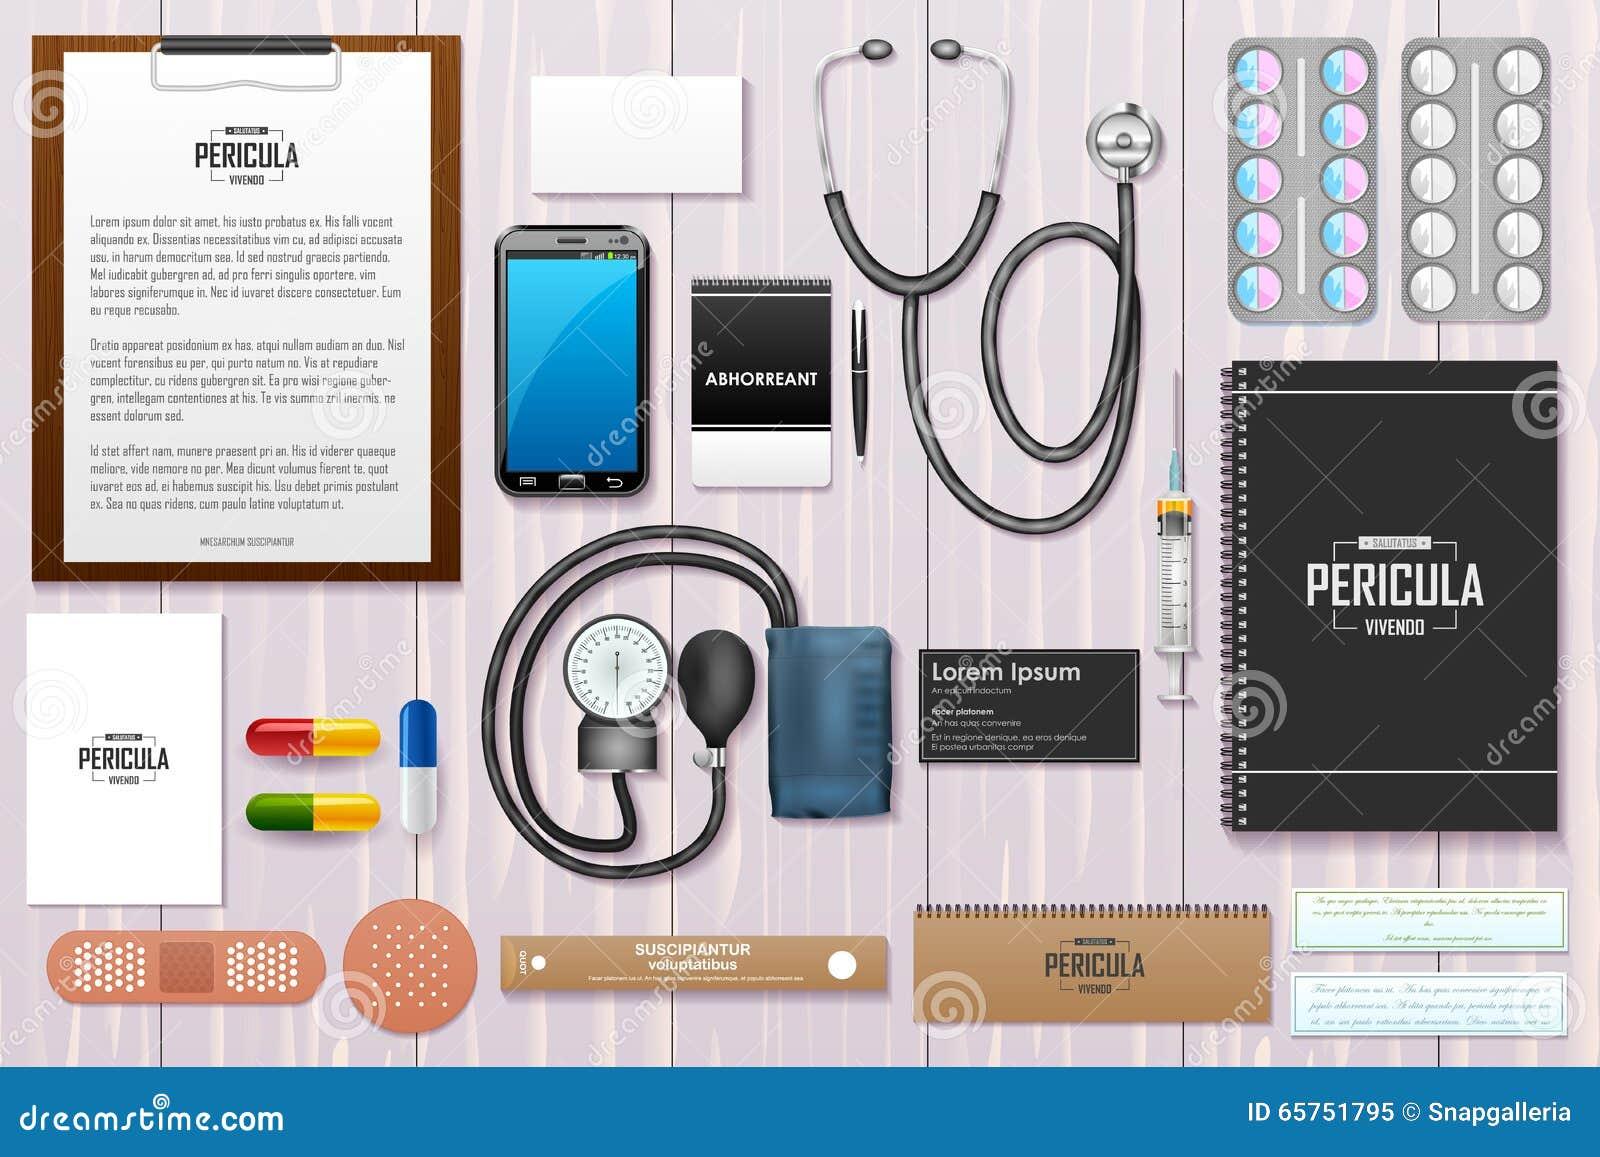 Identity Branding Mockup For Doctor Stock Vector - Image: 65751795